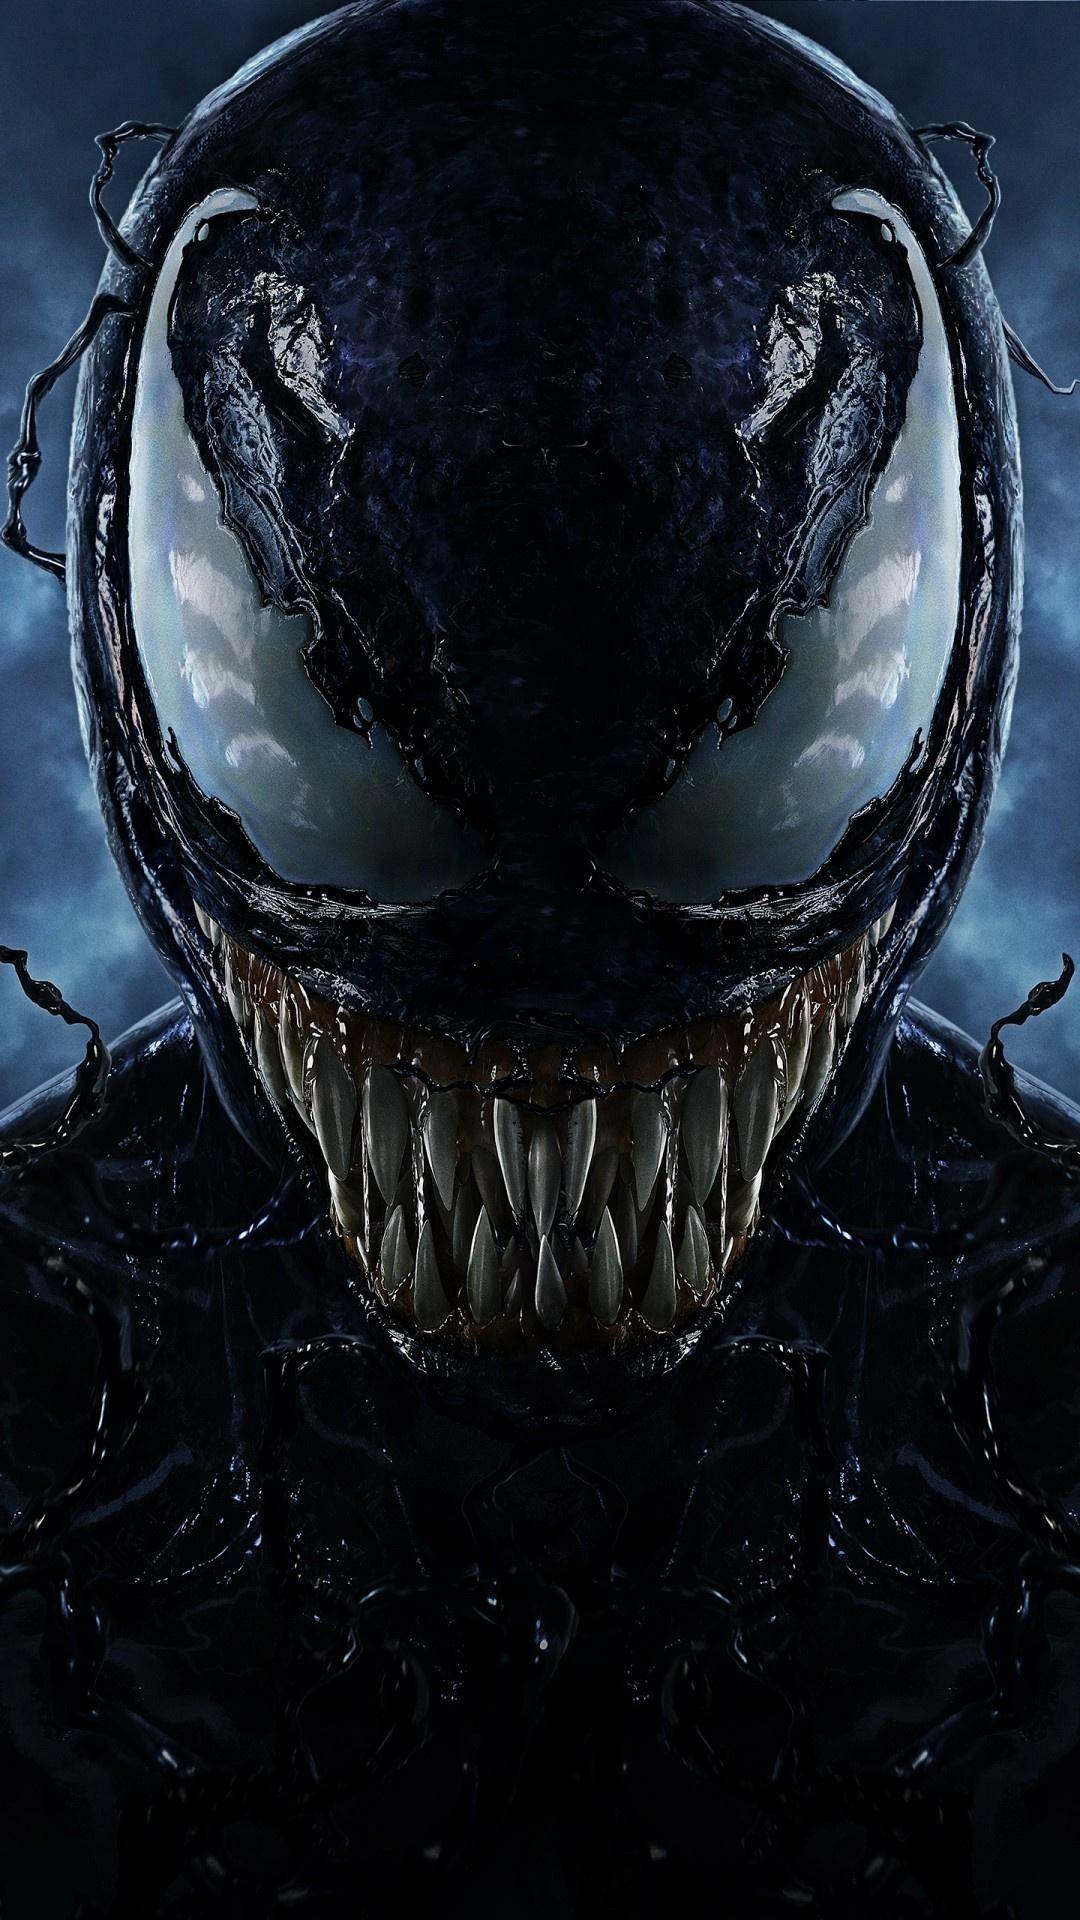 Pin By Marcus Stocks On Venom With Images Venom Comics Venom